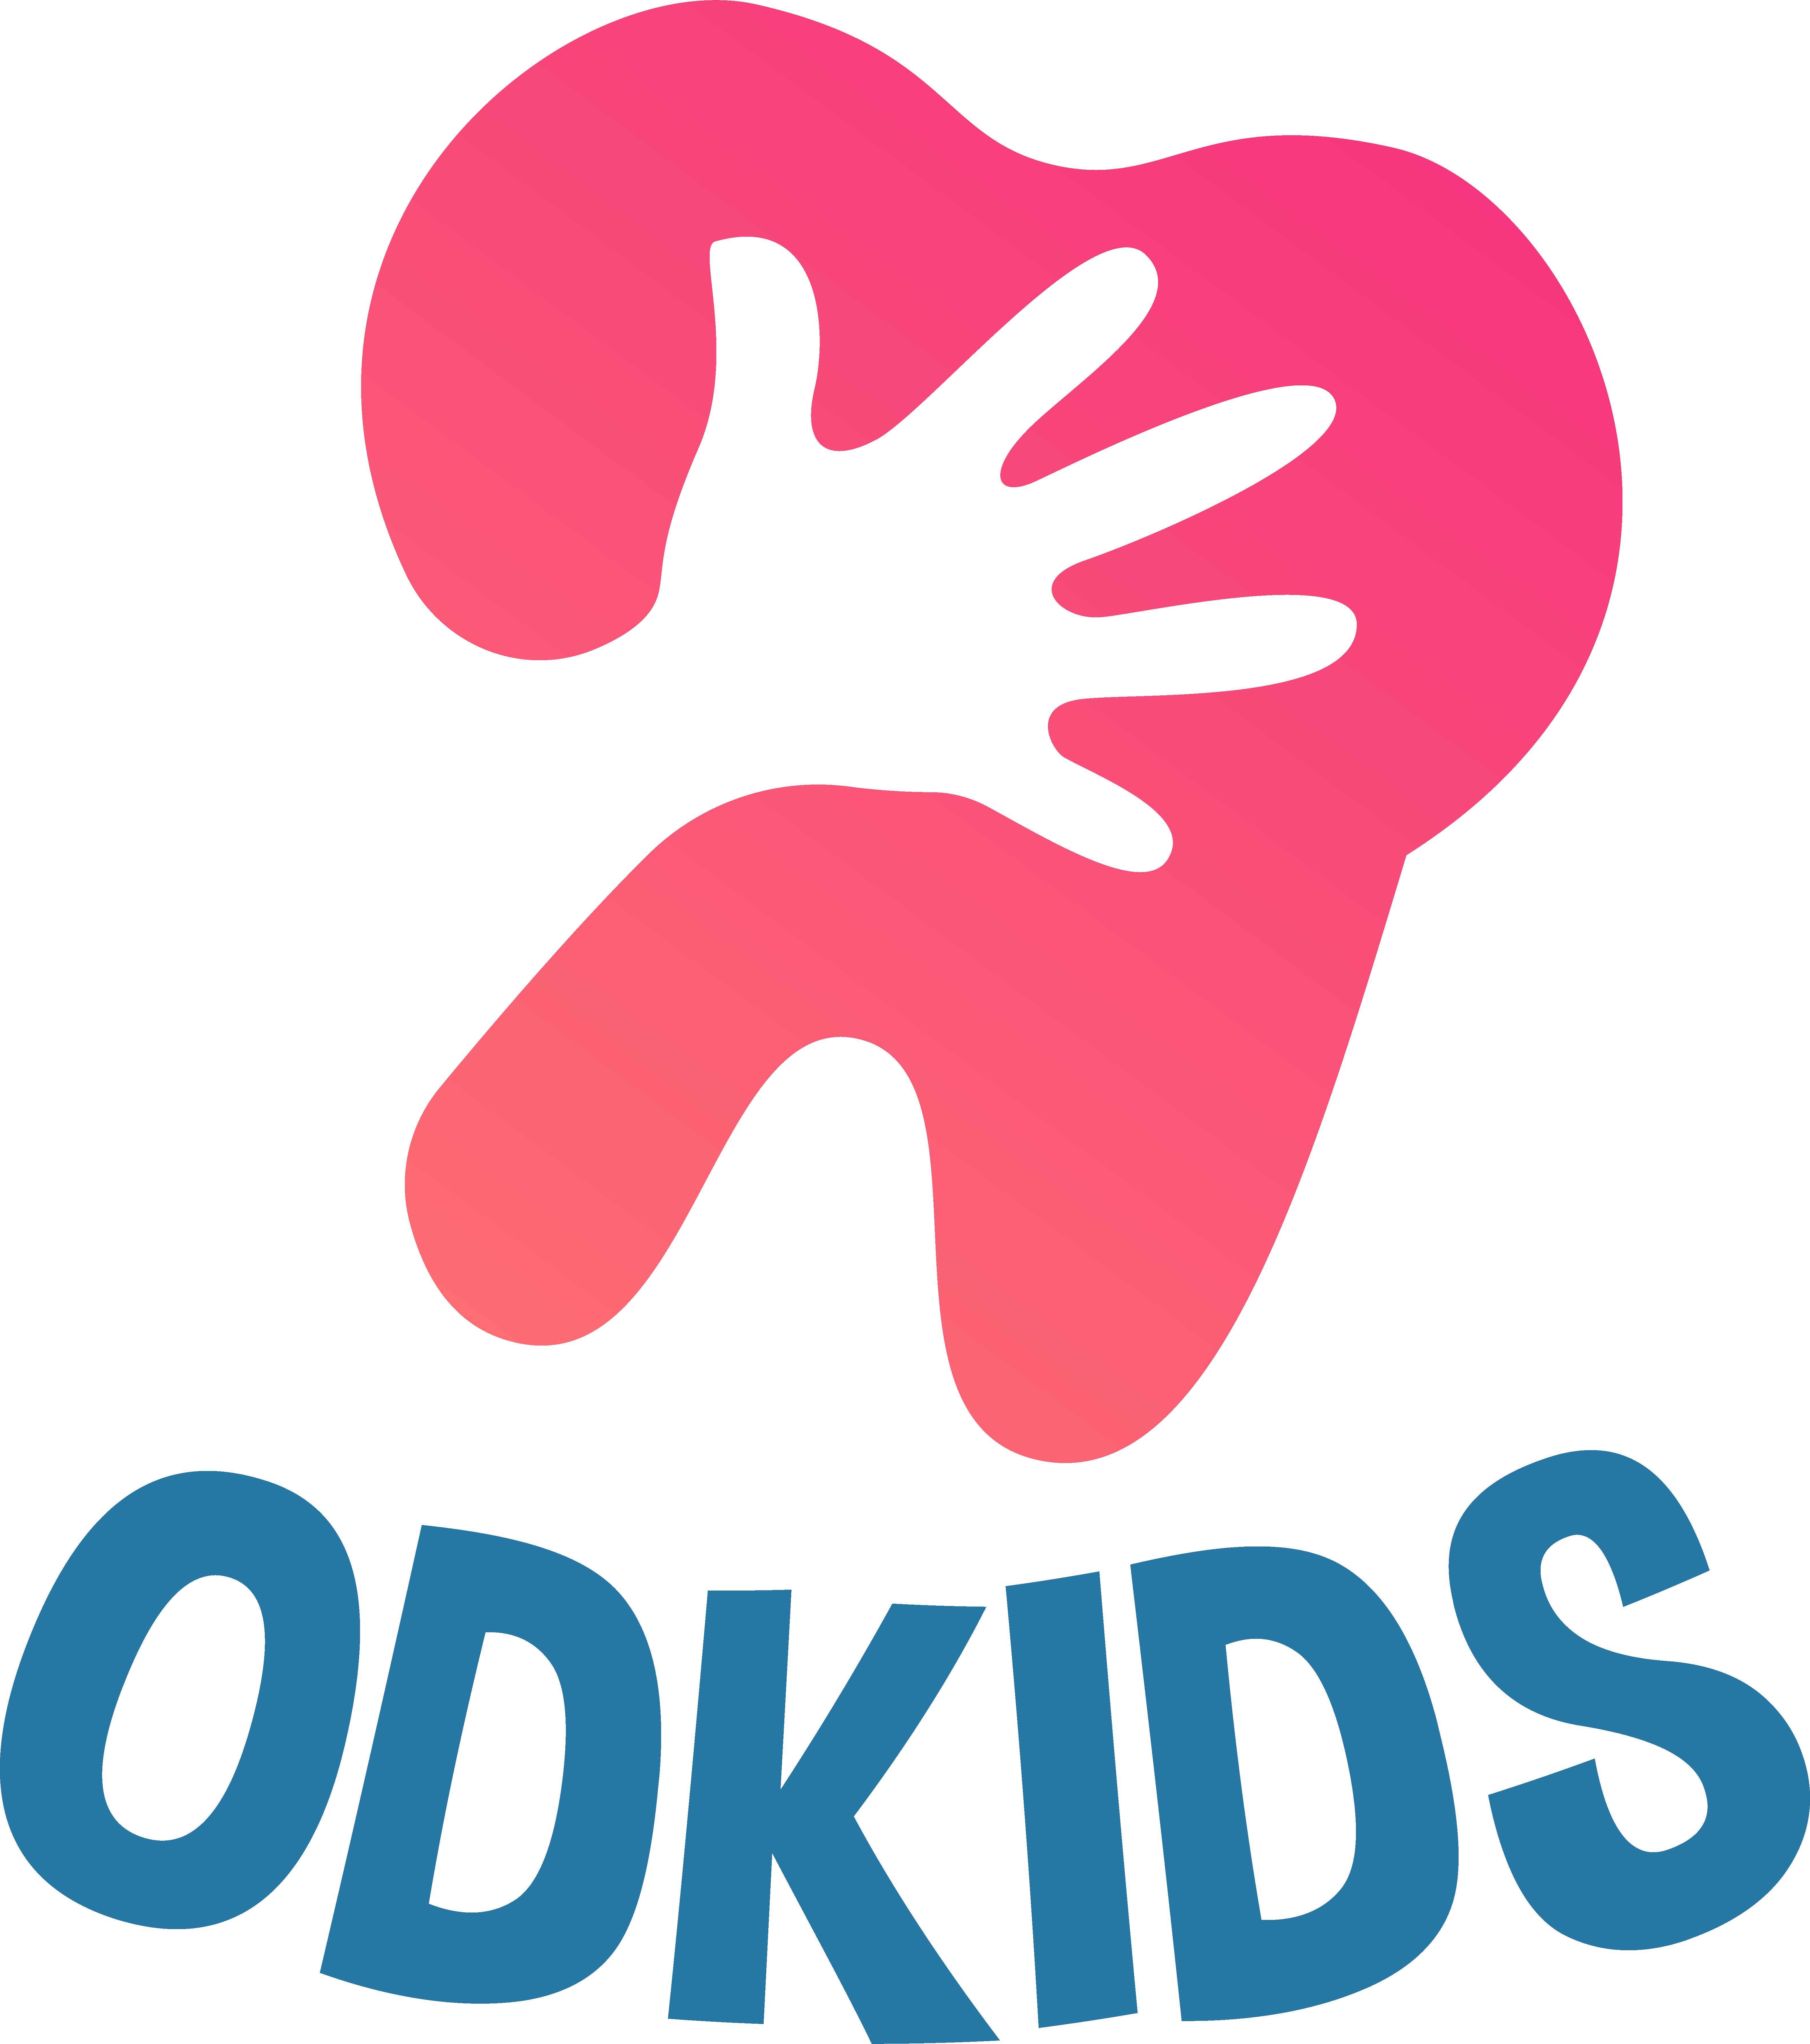 Odkids